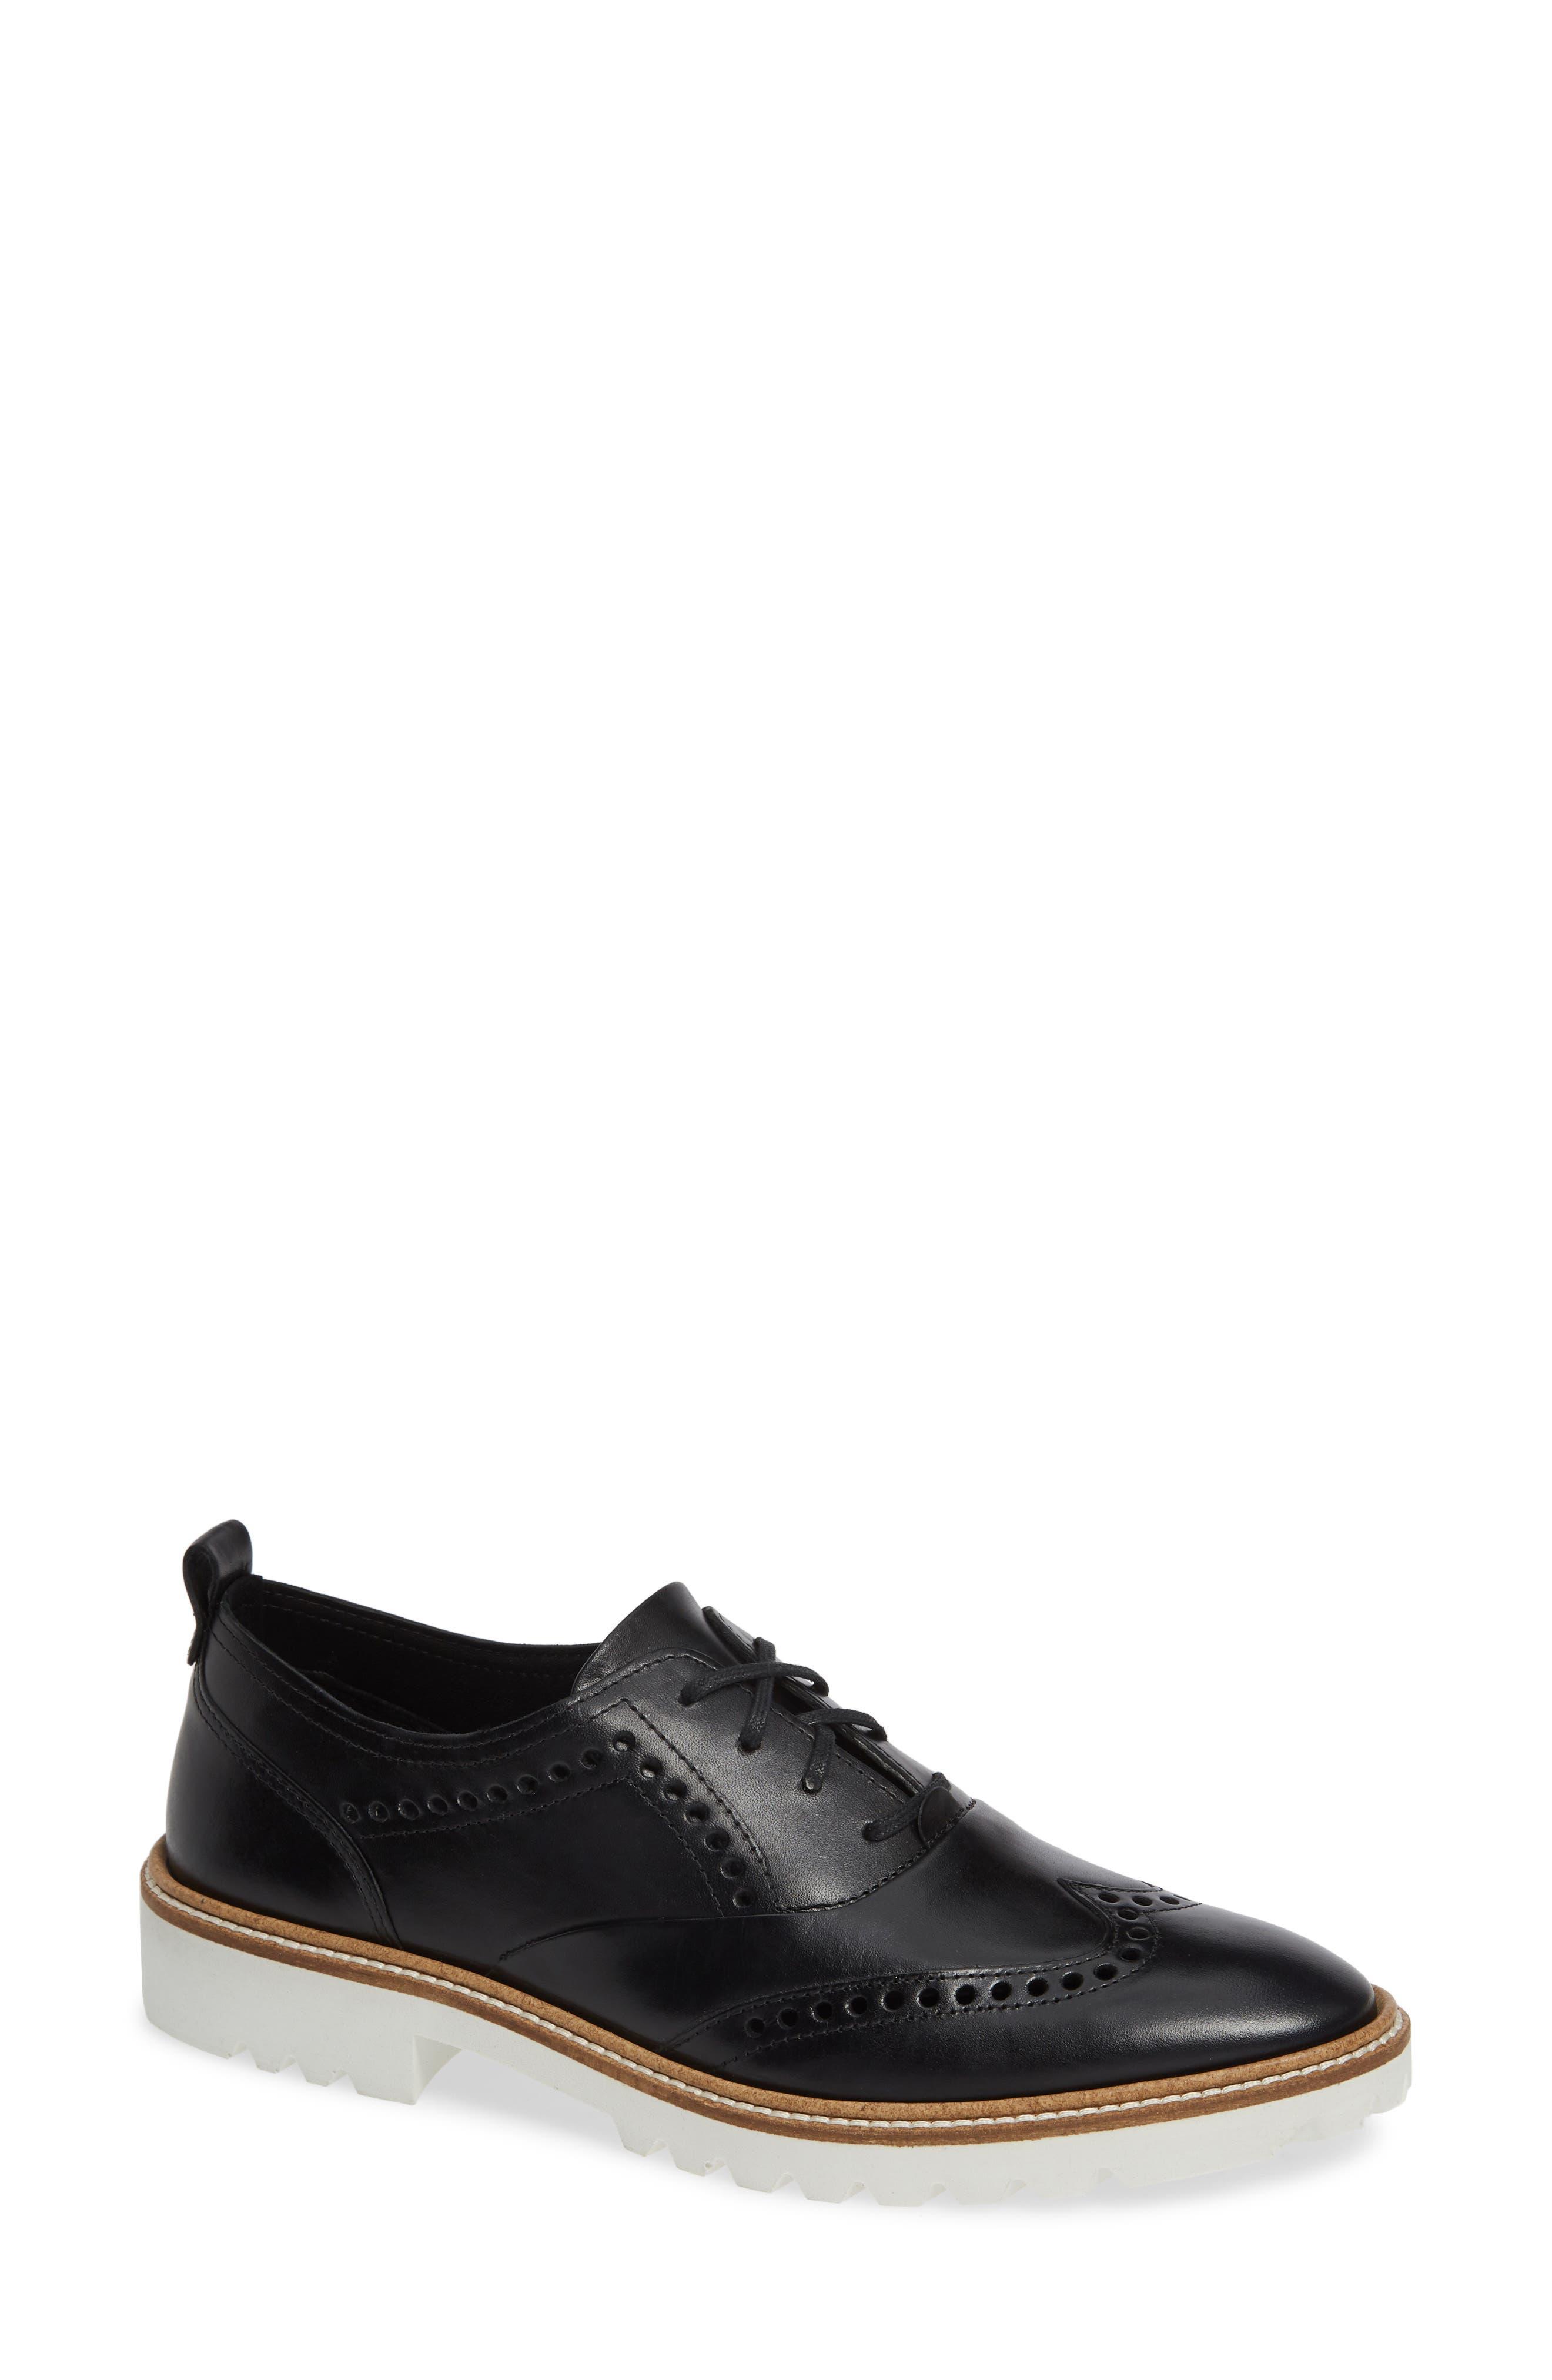 Ecco Incise Tailored Wingtip Oxford, Black